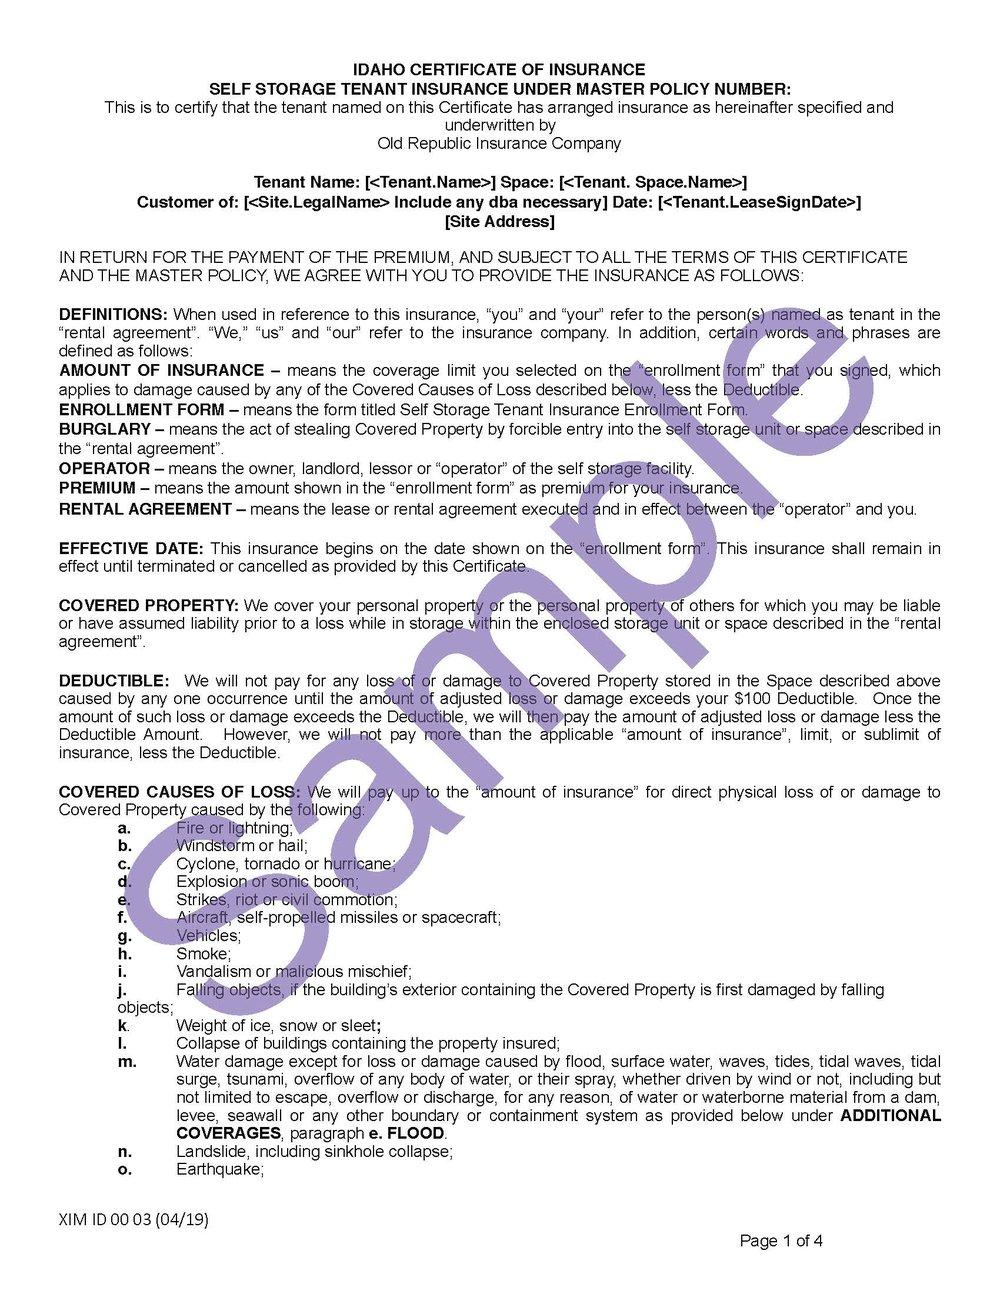 XIM ID 00 03 04 19 Idaho Certificate of InsuranceSample_Page_1.jpg